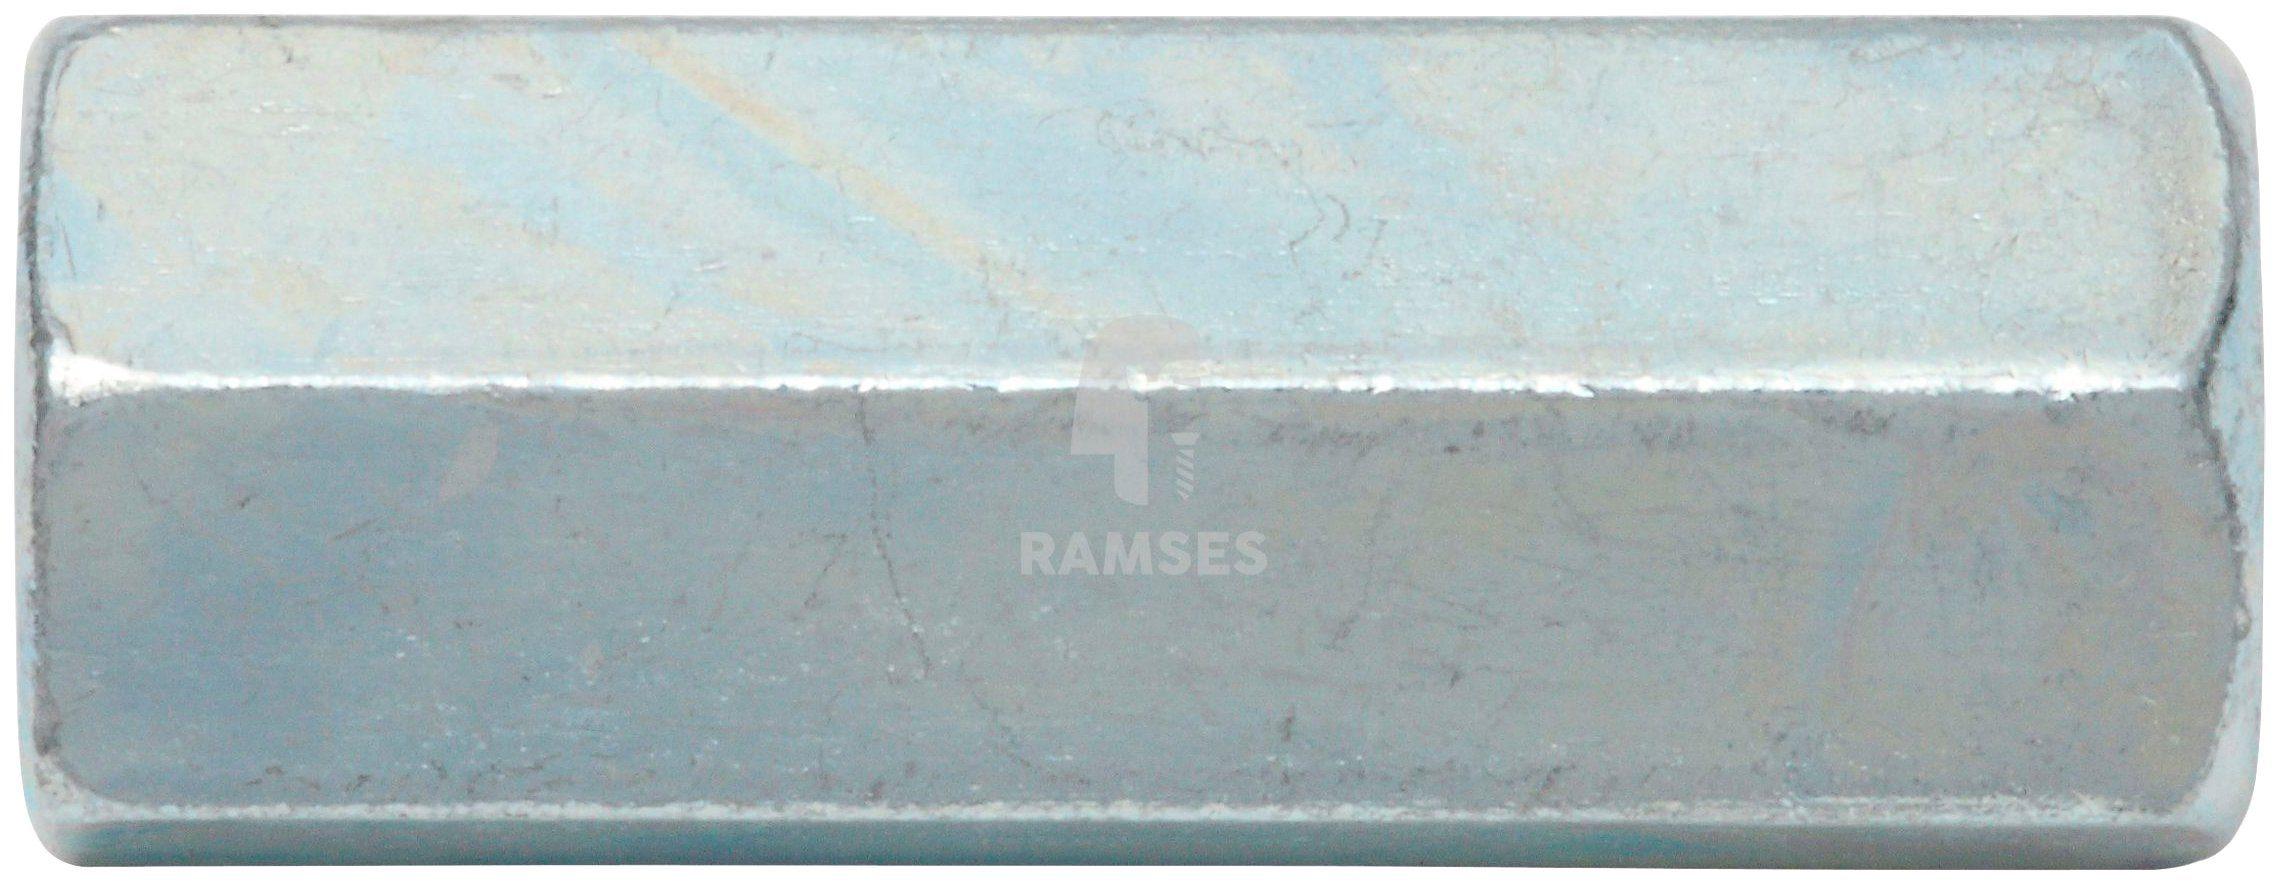 RAMSES Muffe , Sechskant Gewindemuffe M10 X 30 A2